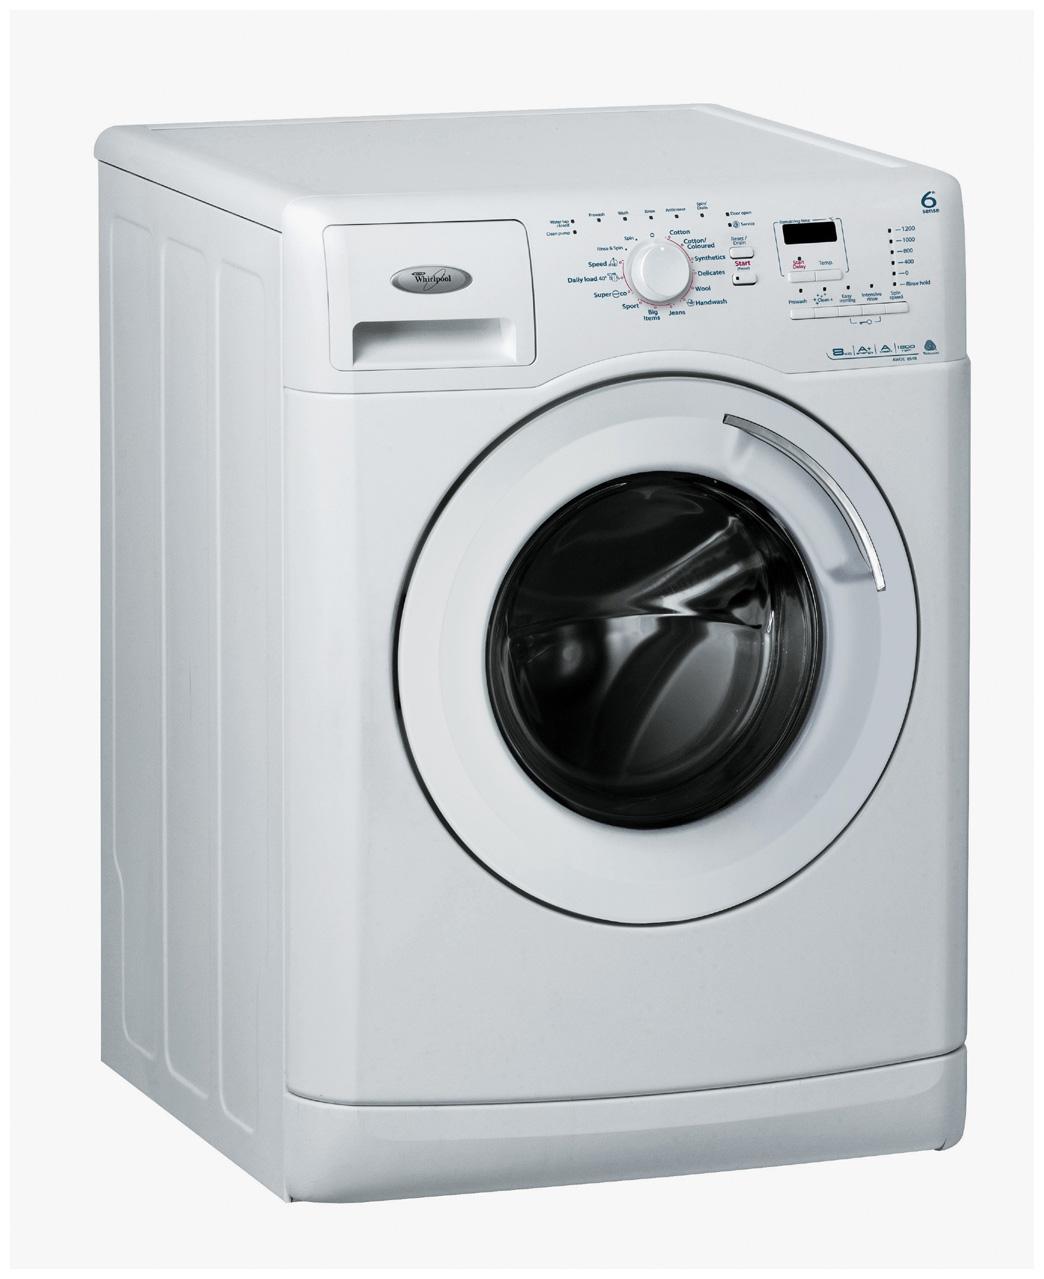 Mesin Cuci Samsung Tabung - Mei